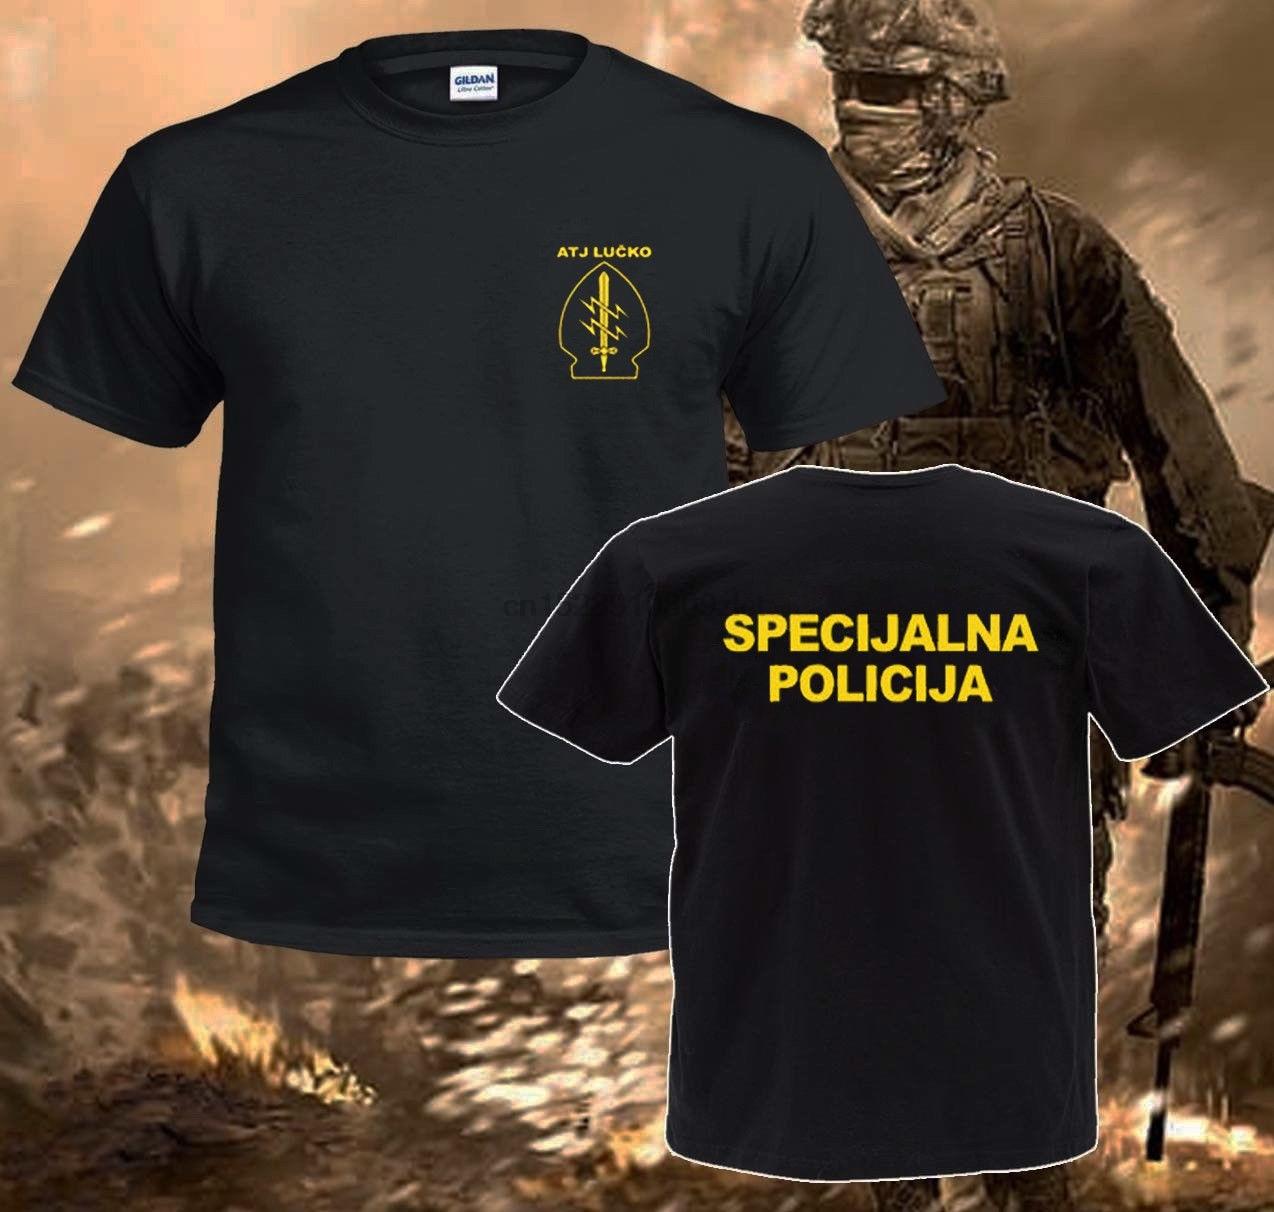 2019 moda venda quente atj lucko croata polícia contra terrorismo crocop preto t camisas camisa